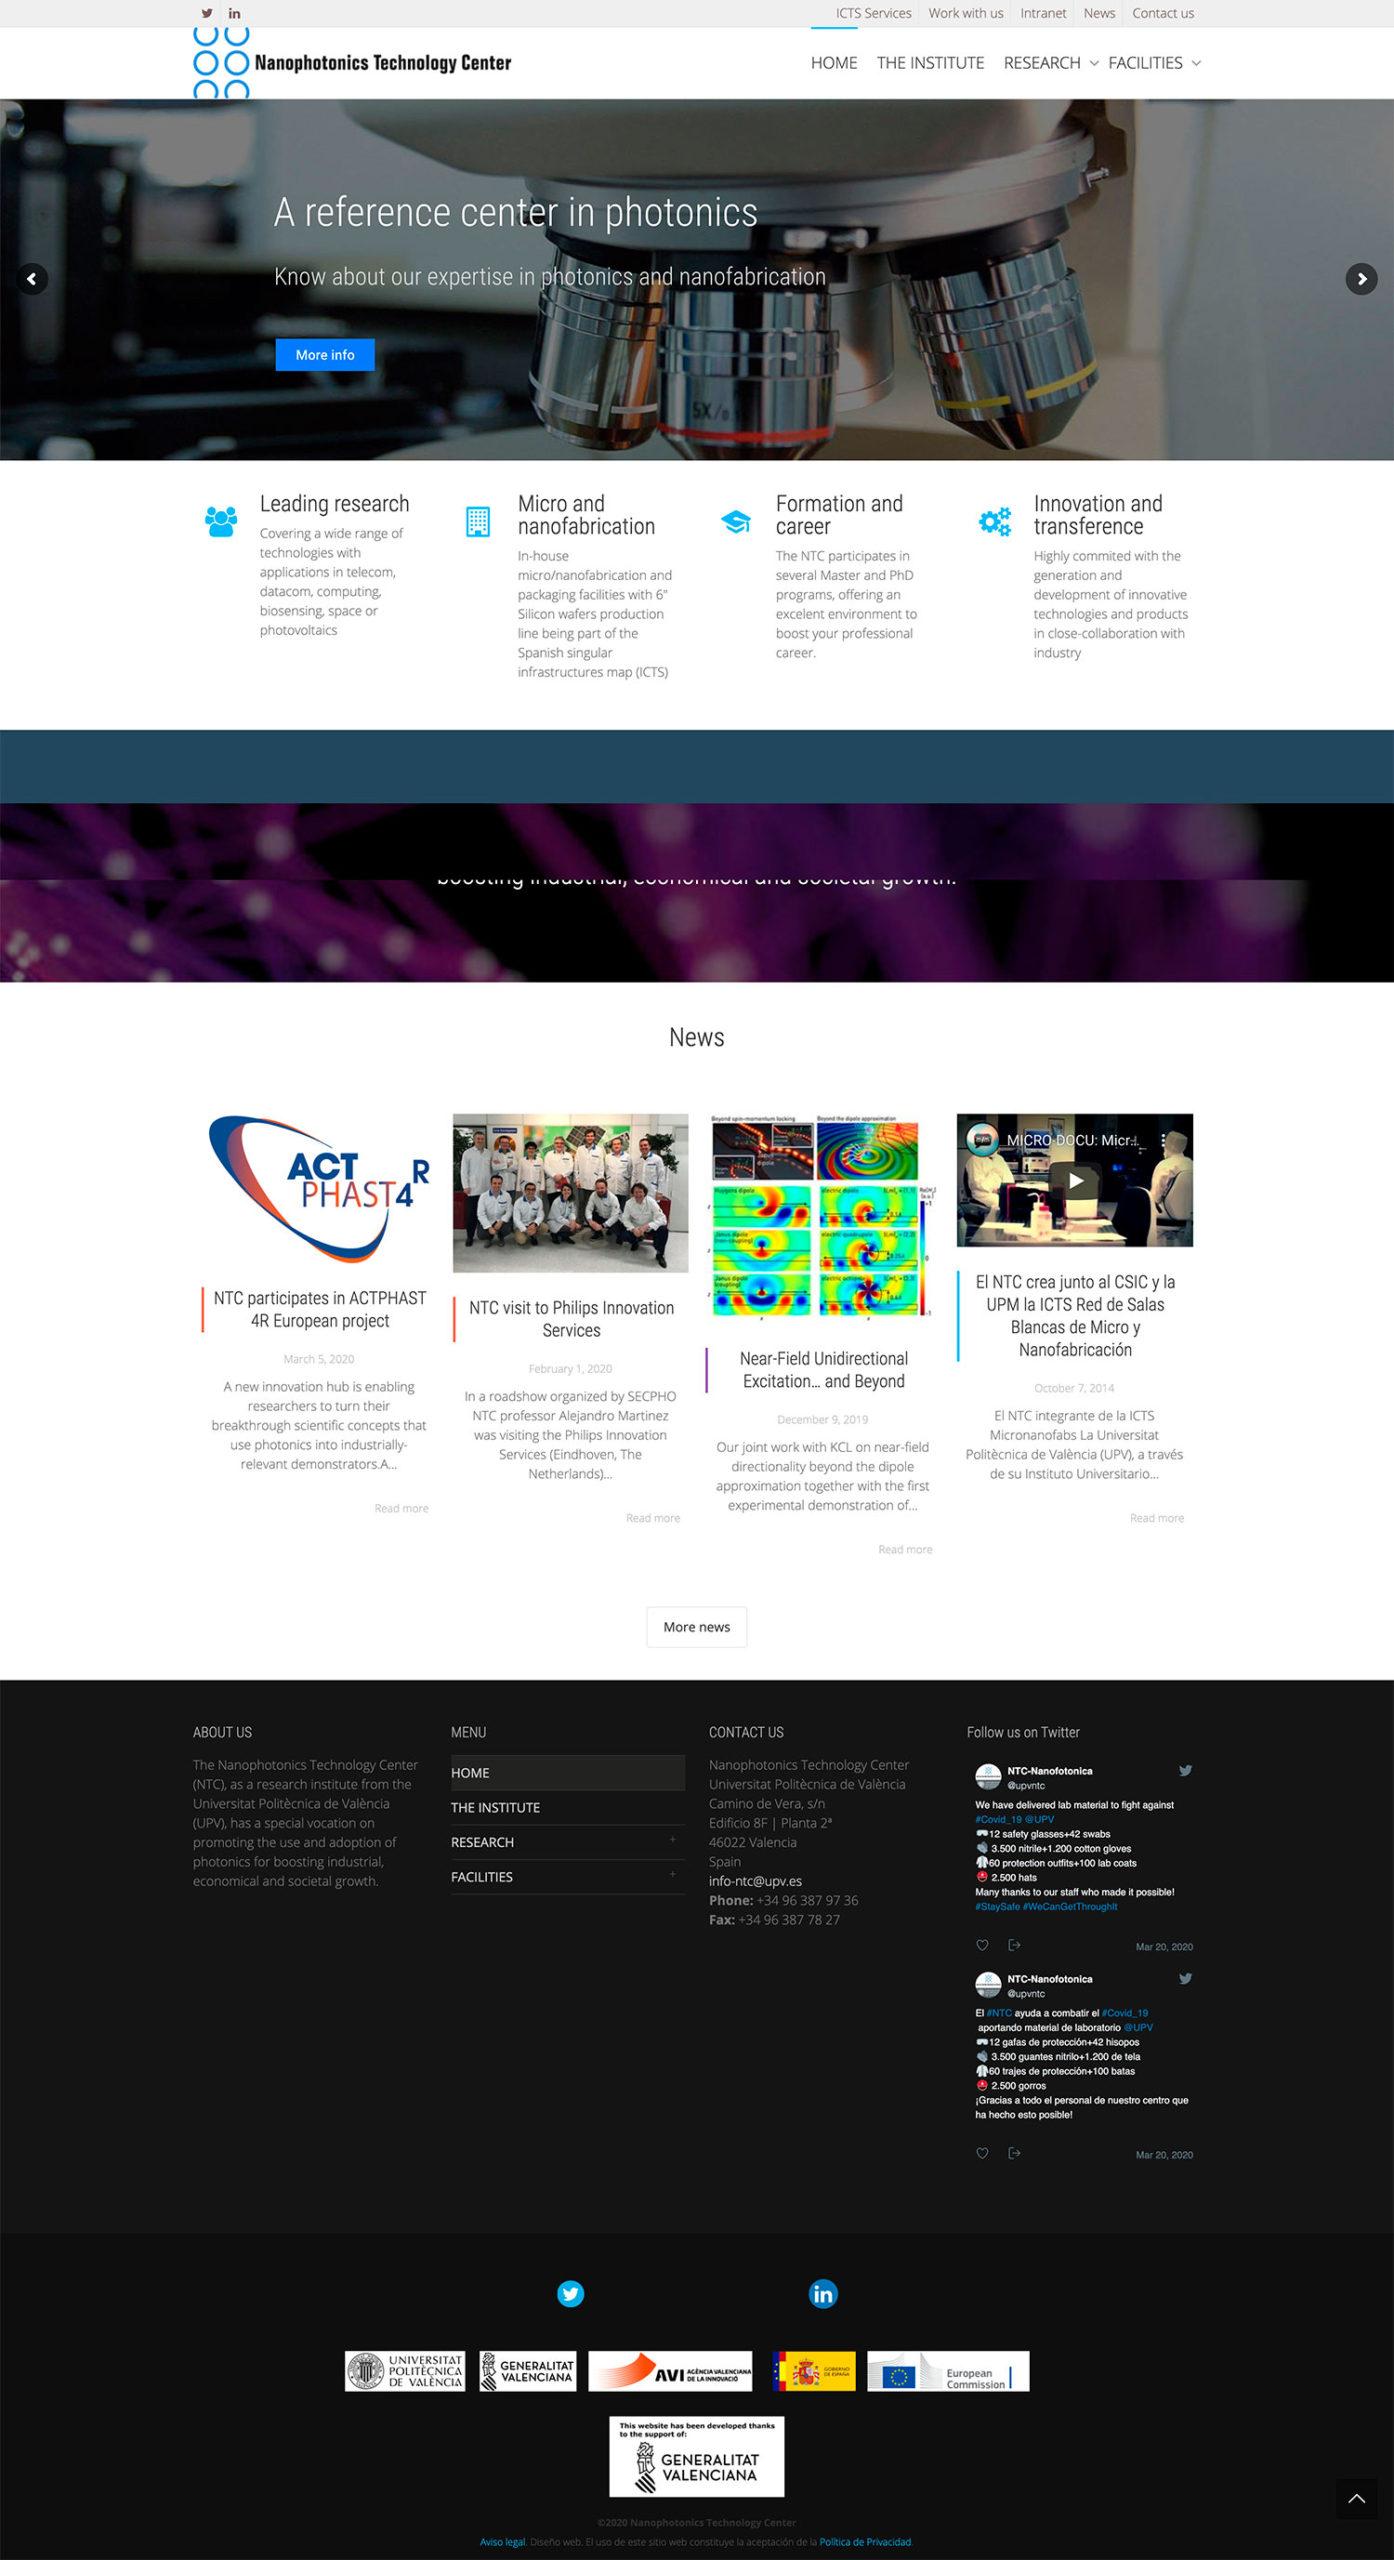 Diseño web Valencia | Diseño página web Instituto Nanofotónica UPV